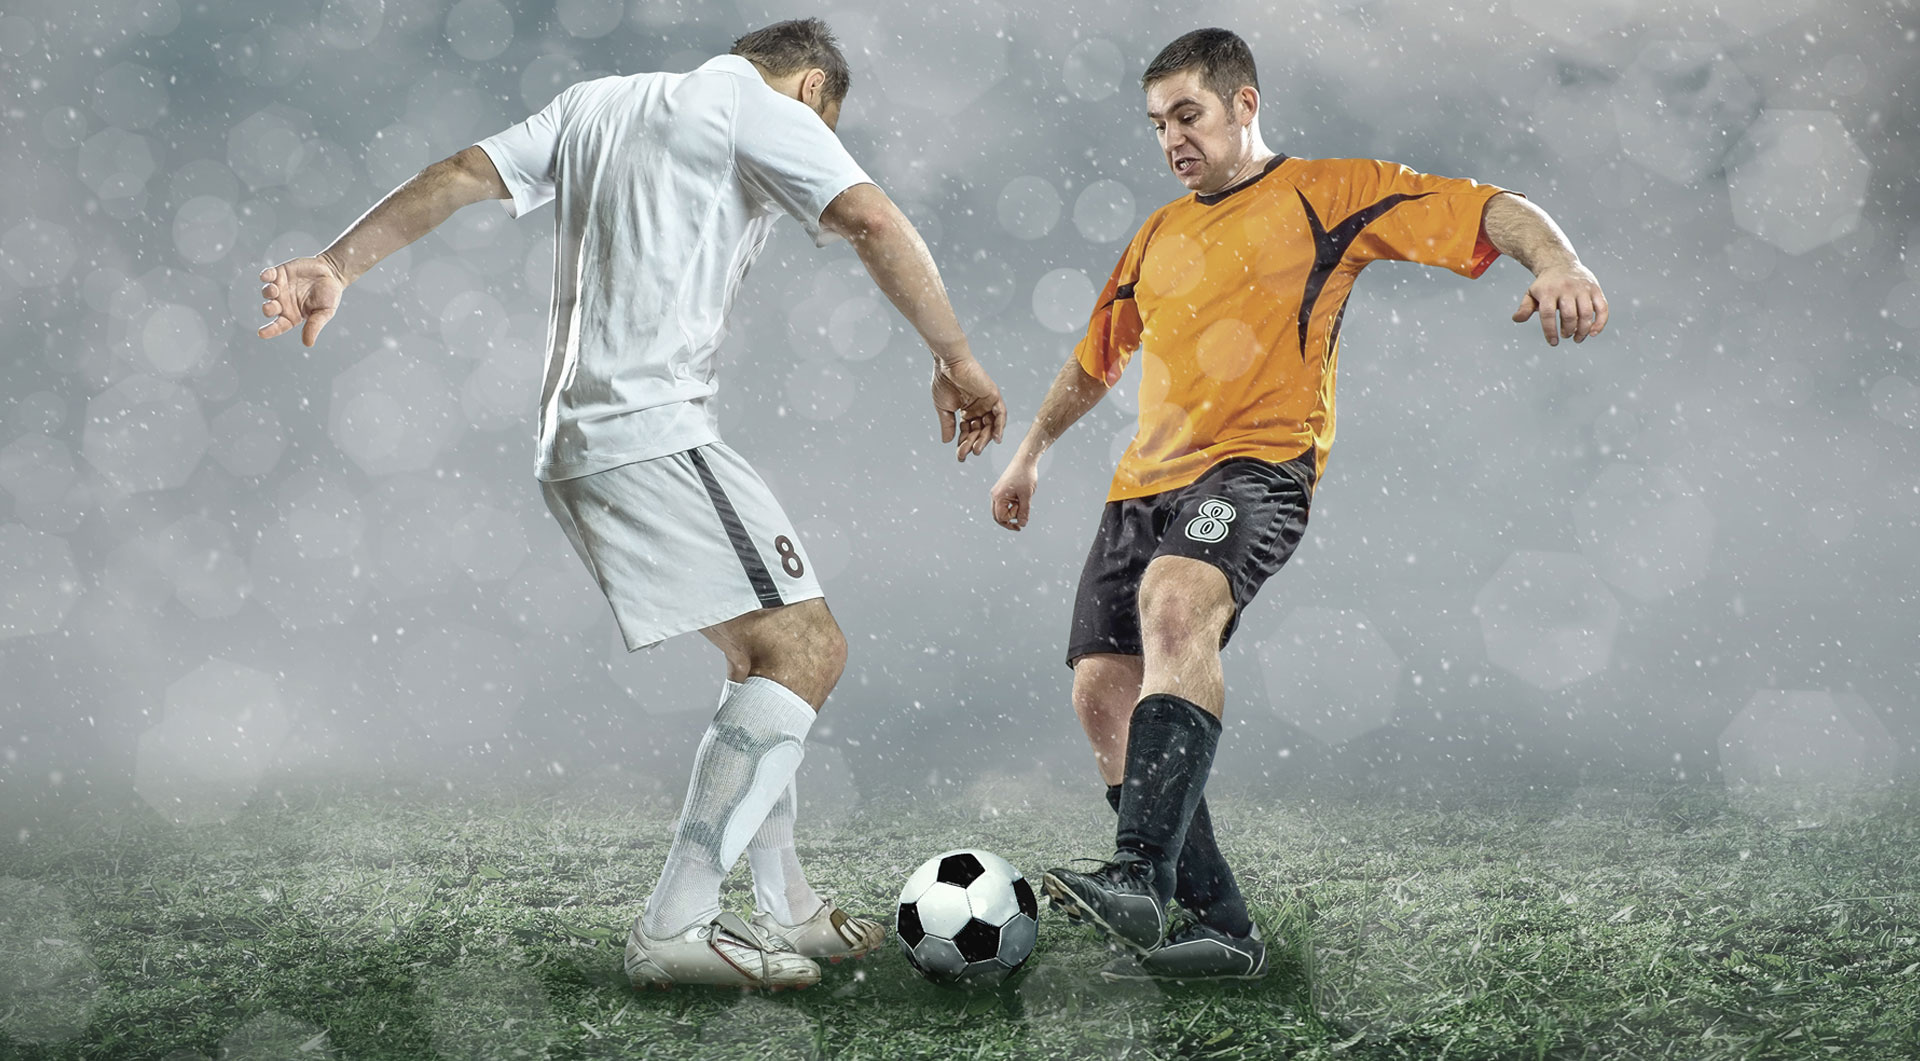 watch-bertens-vs-williams-us-open-round-2-live